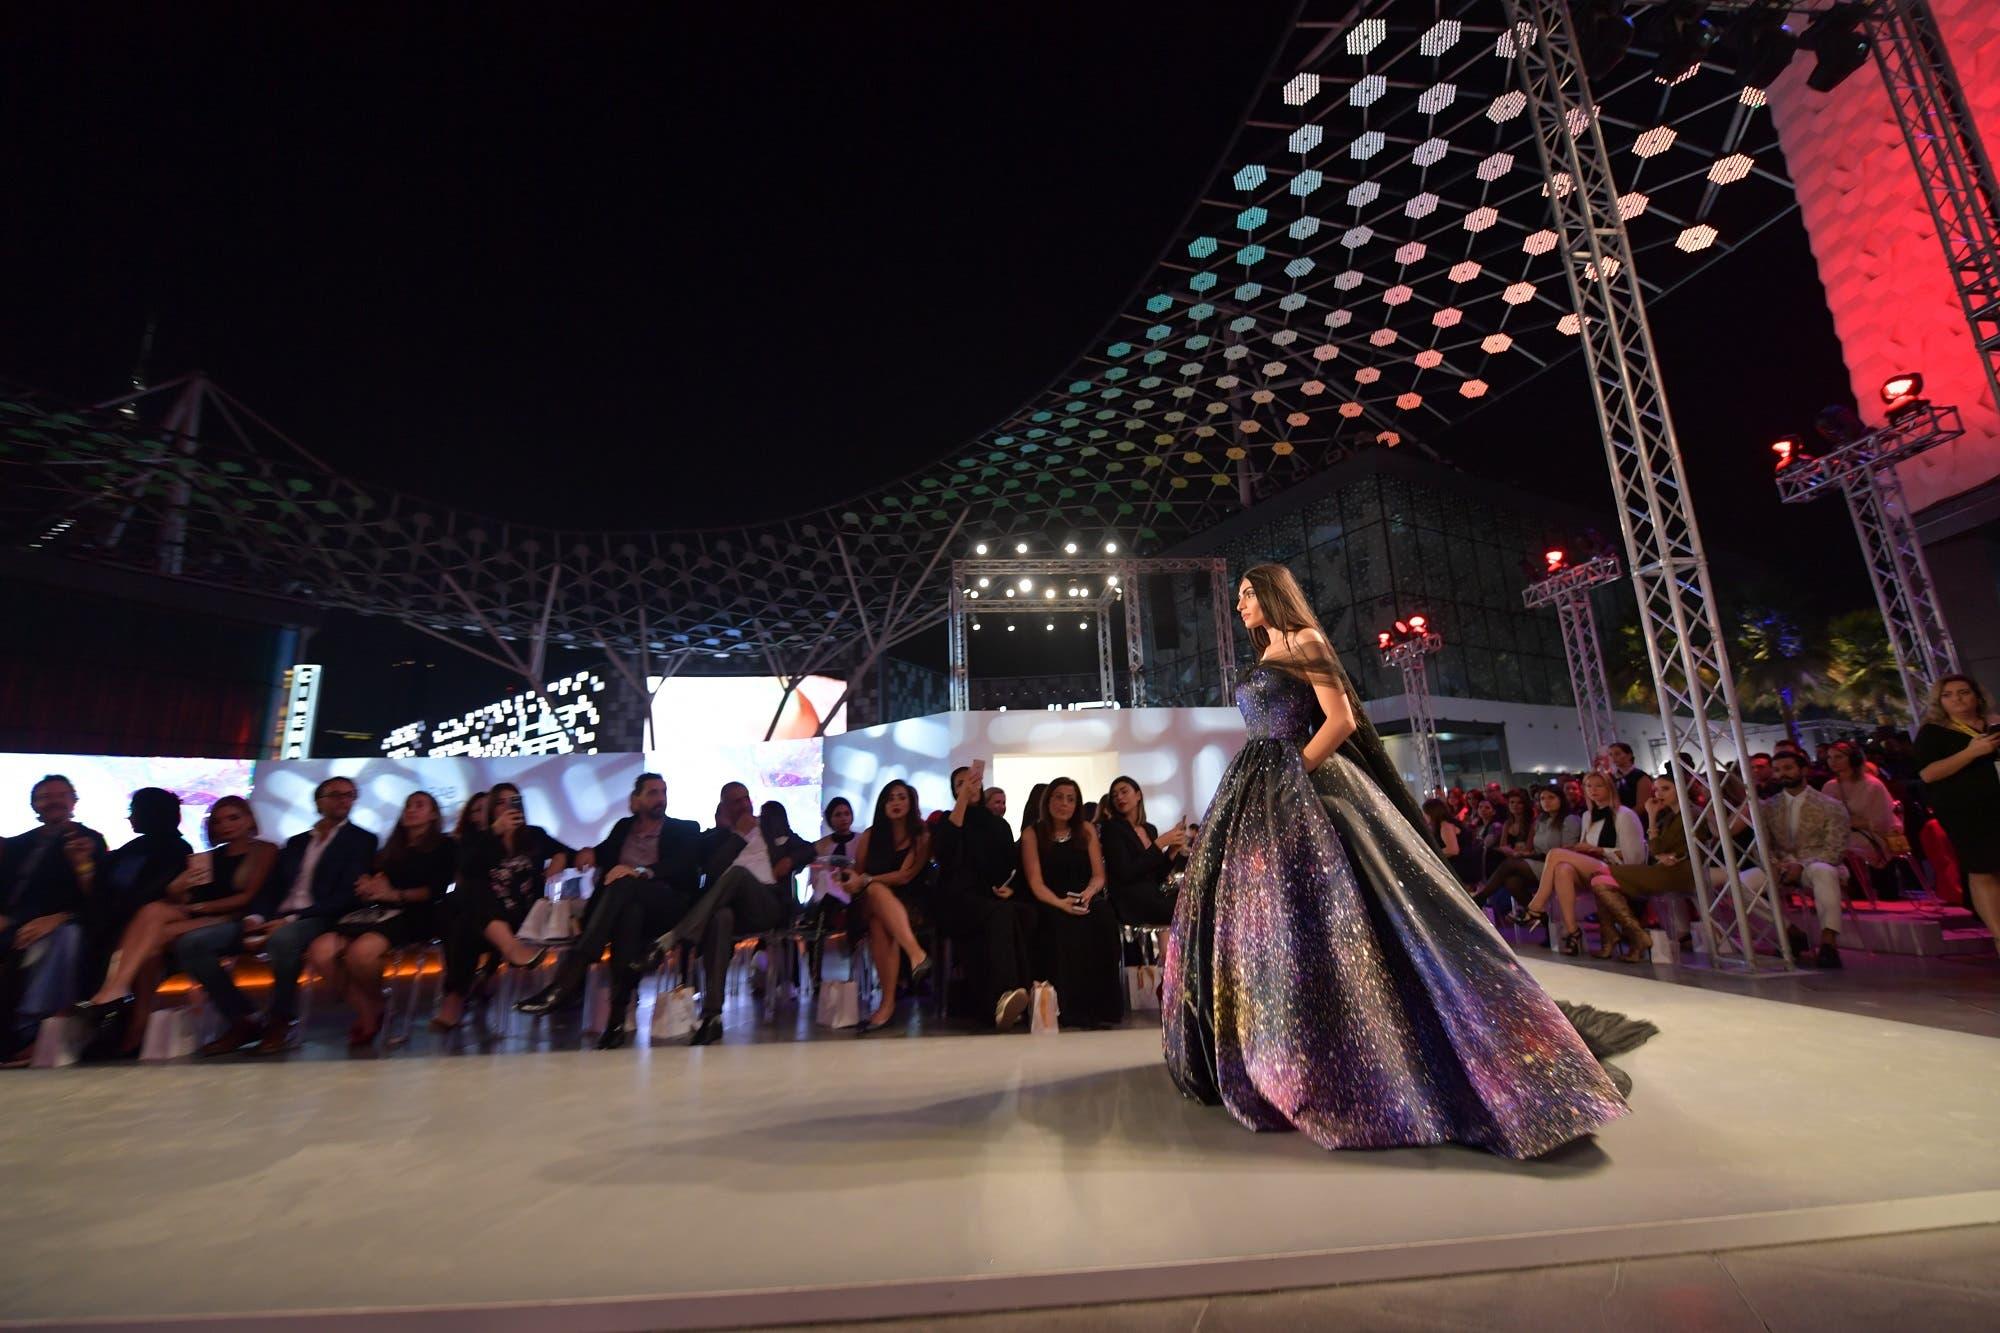 A model presents on the catwalk a creation of Aiisha Ramadan during the Arab Fashion Week in Dubai on November 15, 2017. (AFP)